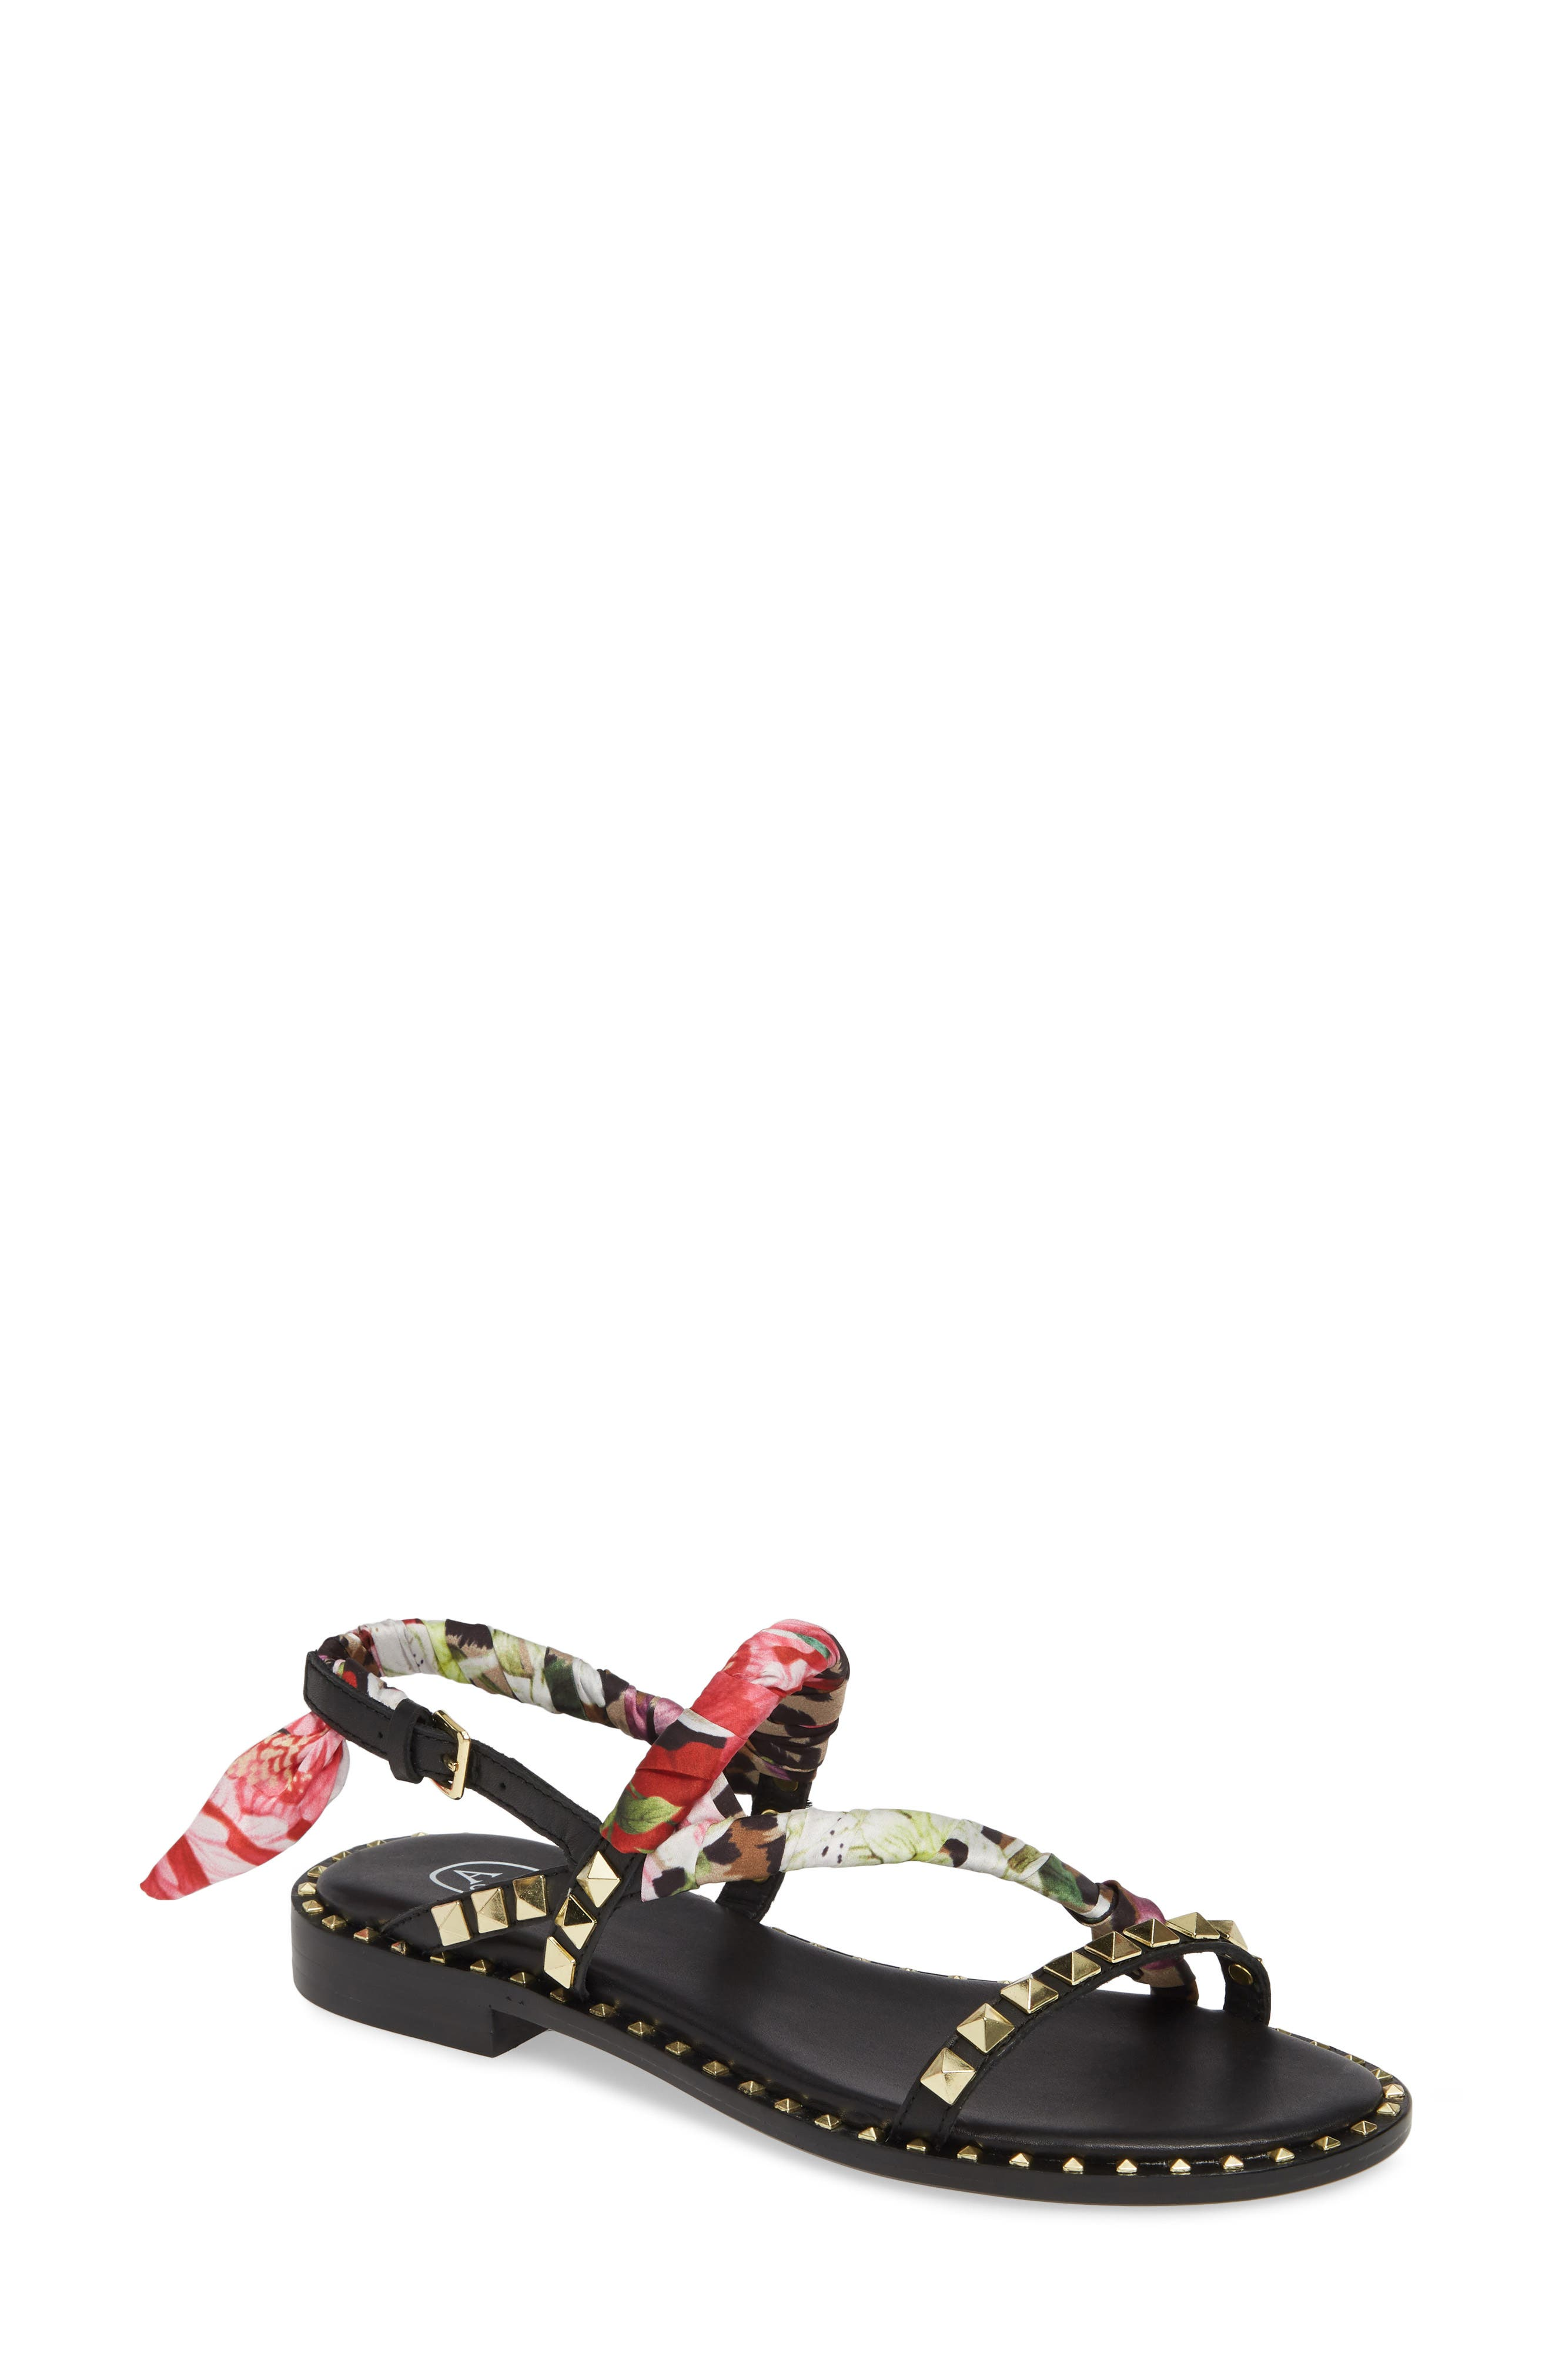 ASH Pattaya Sandal, Main, color, BLACK FLORAL/ CHEETAH PRINT